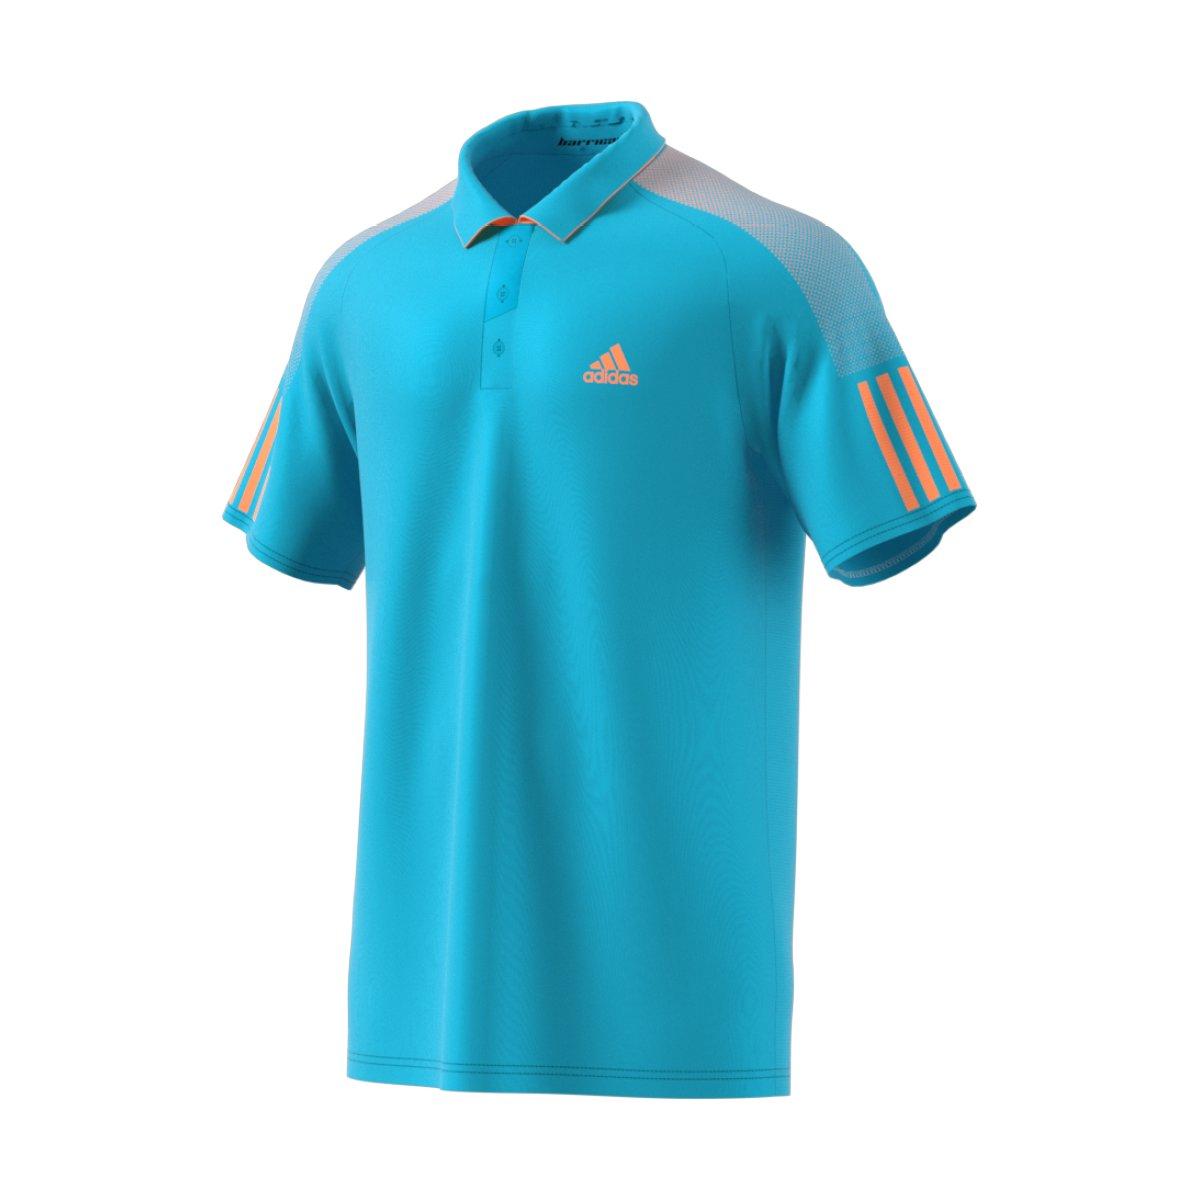 Adidas barricade polo shirt men samba blue glow orange for Adidas barricade polo shirt